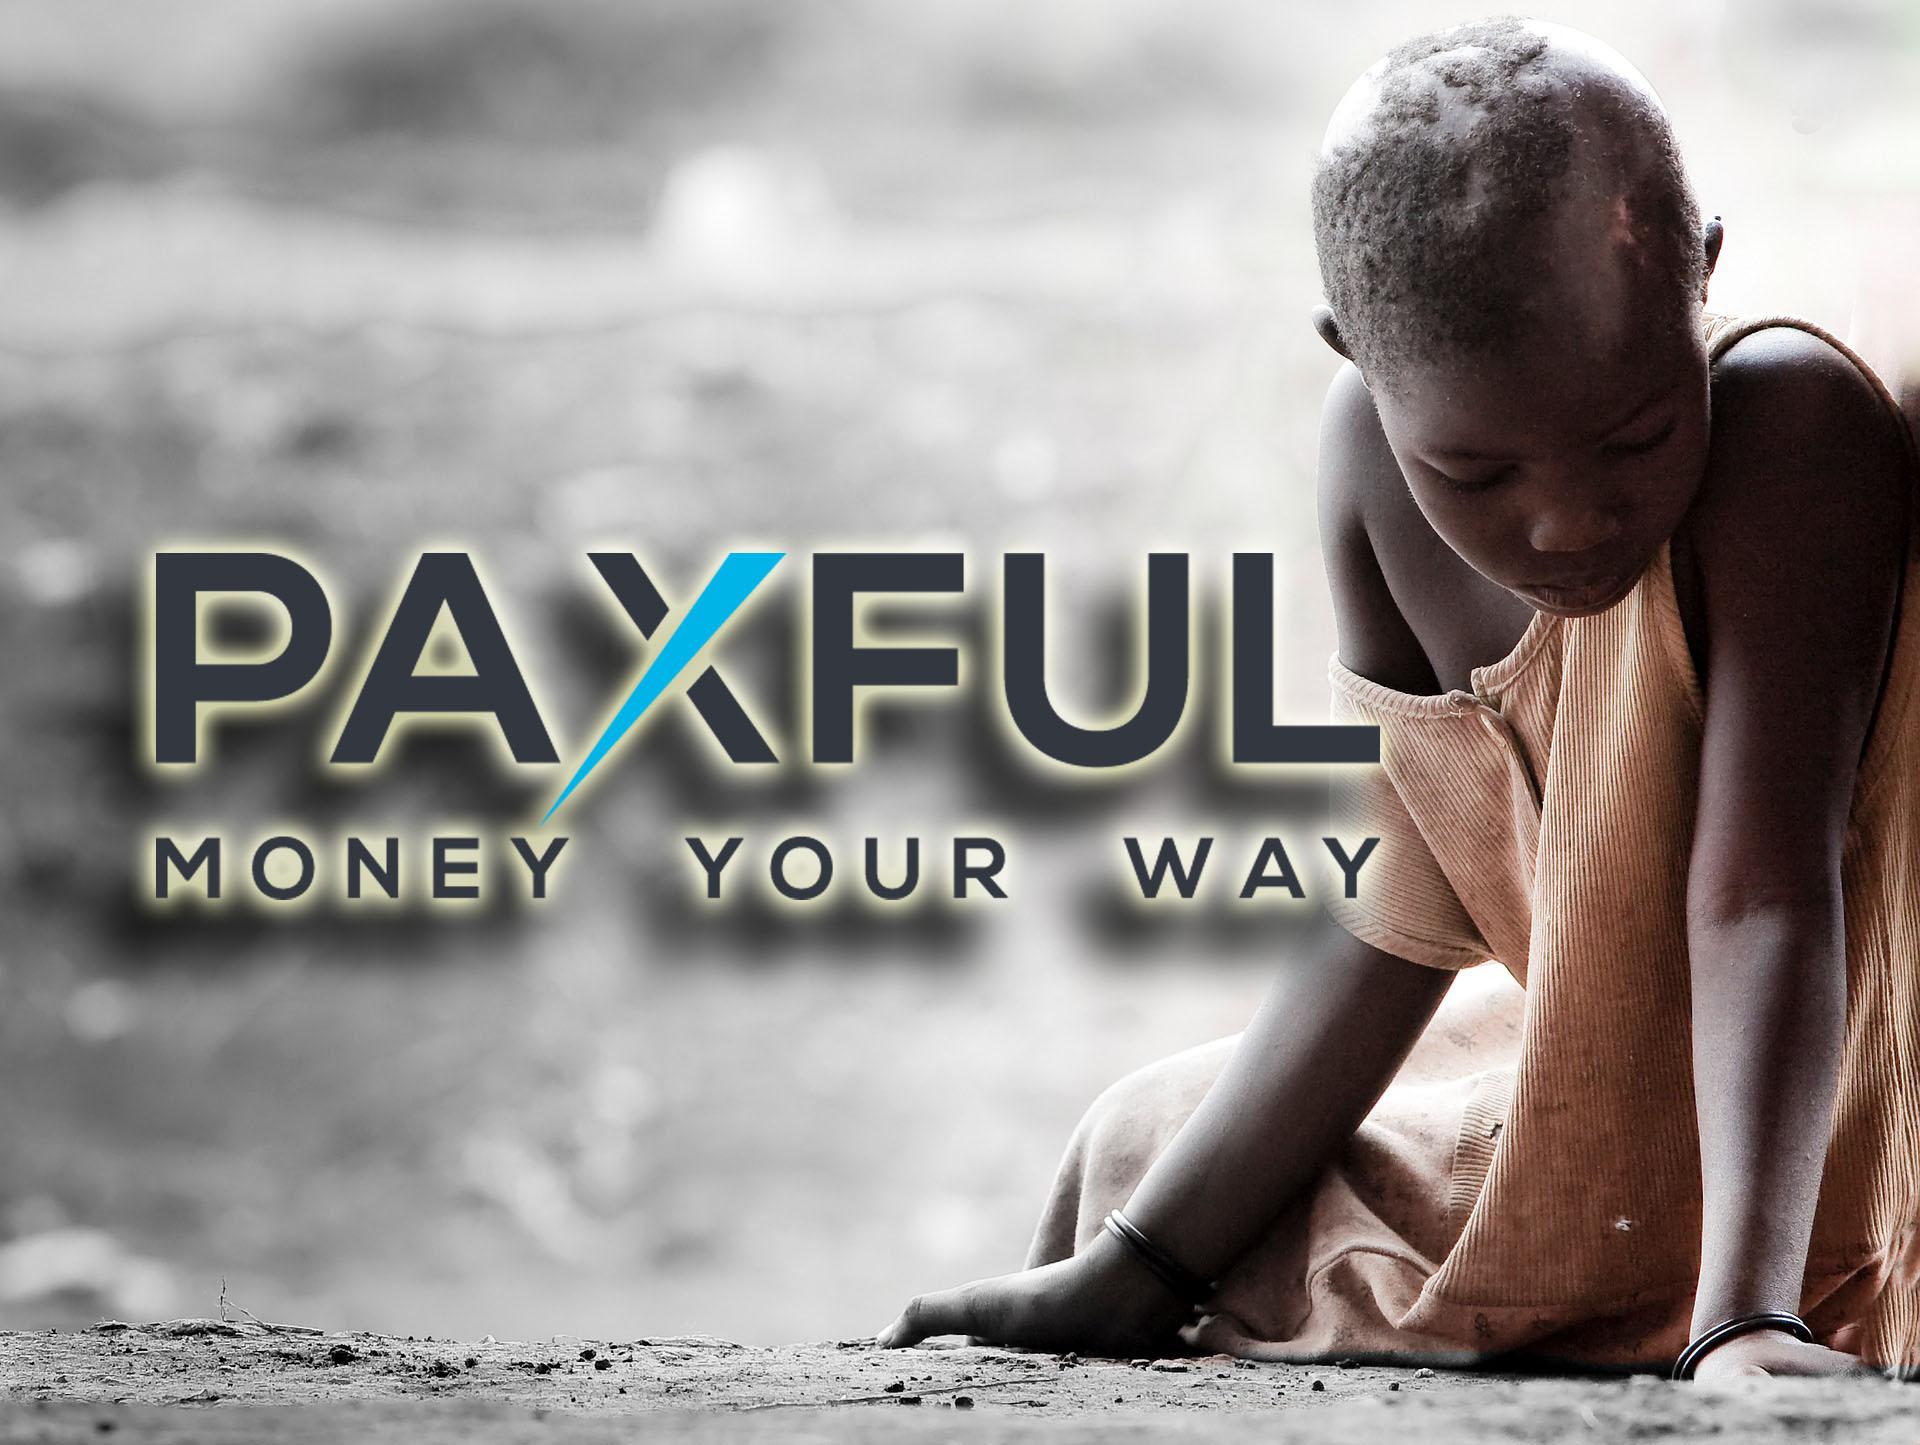 Paxful「ビットコイン寄付キャンペーン」を開始!新型コロナからアフリカを支援